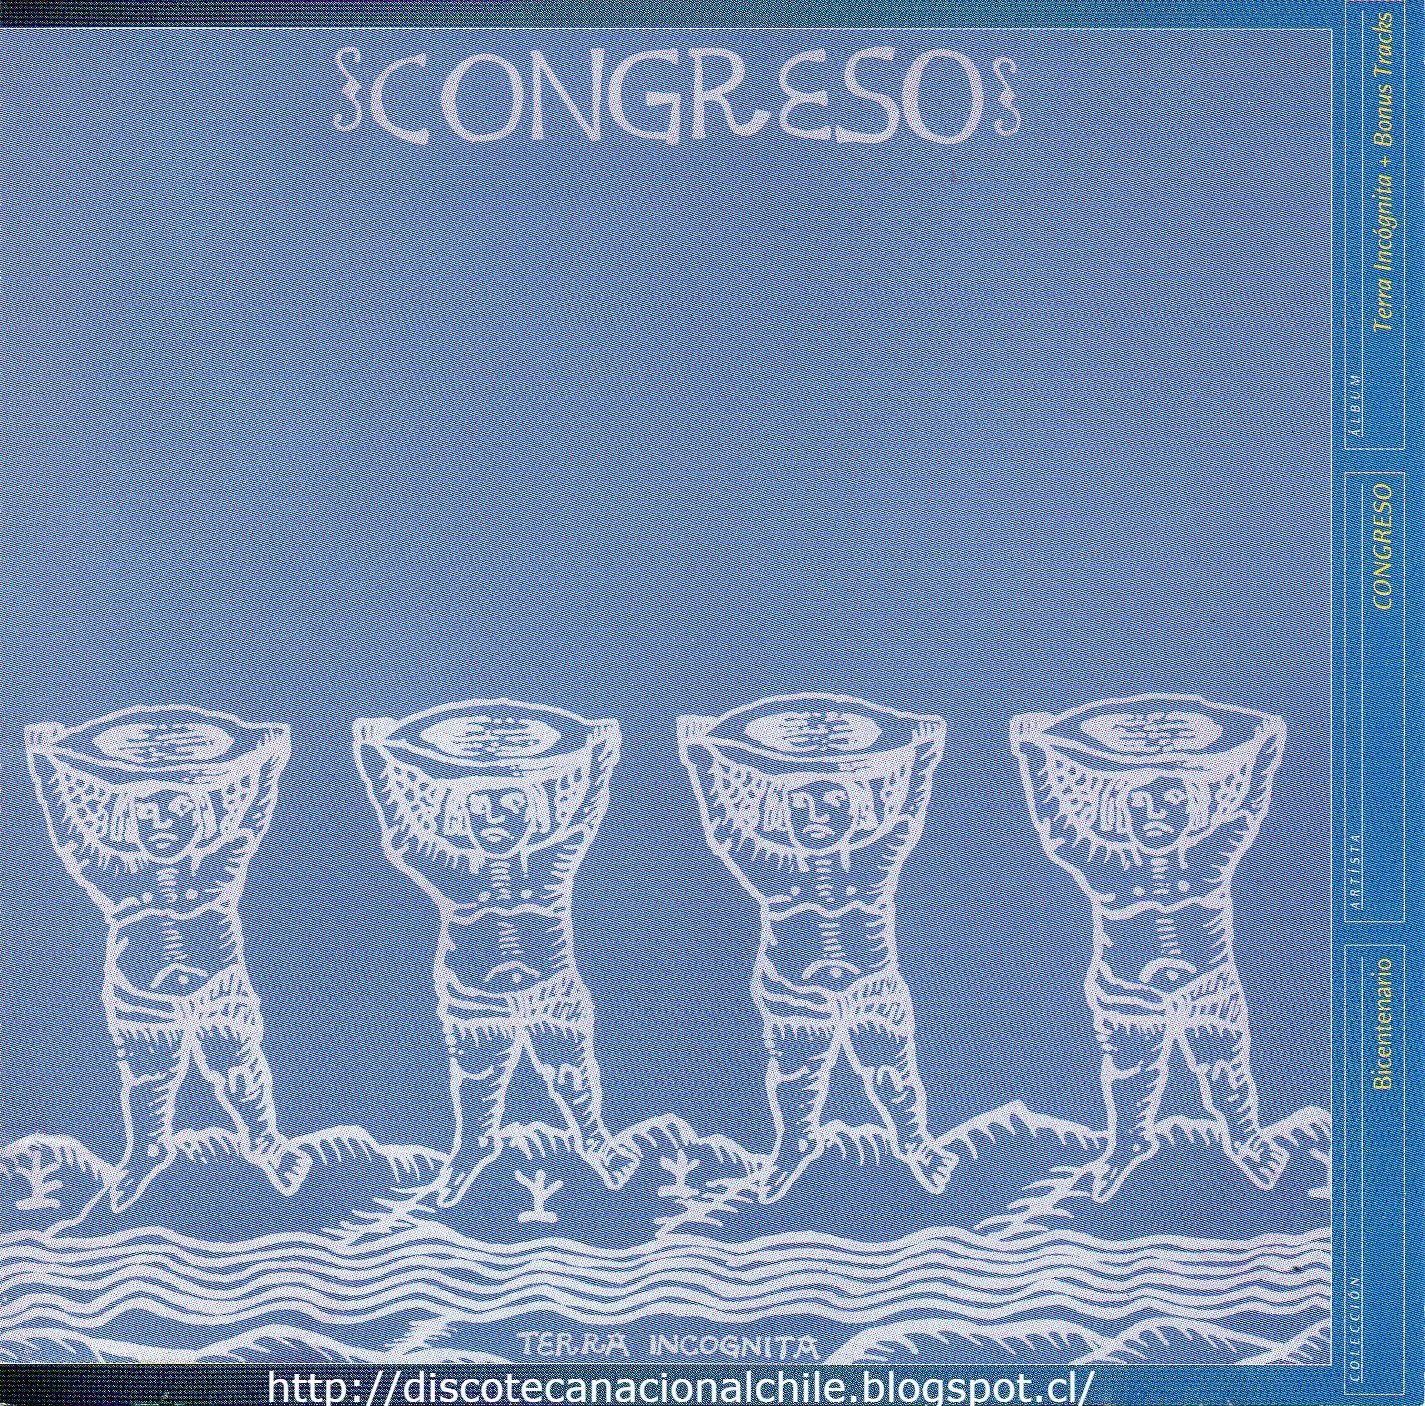 Terra incógnita + Bonus Tracks . 505674 2. Emi Music Chile. 2008. Chile